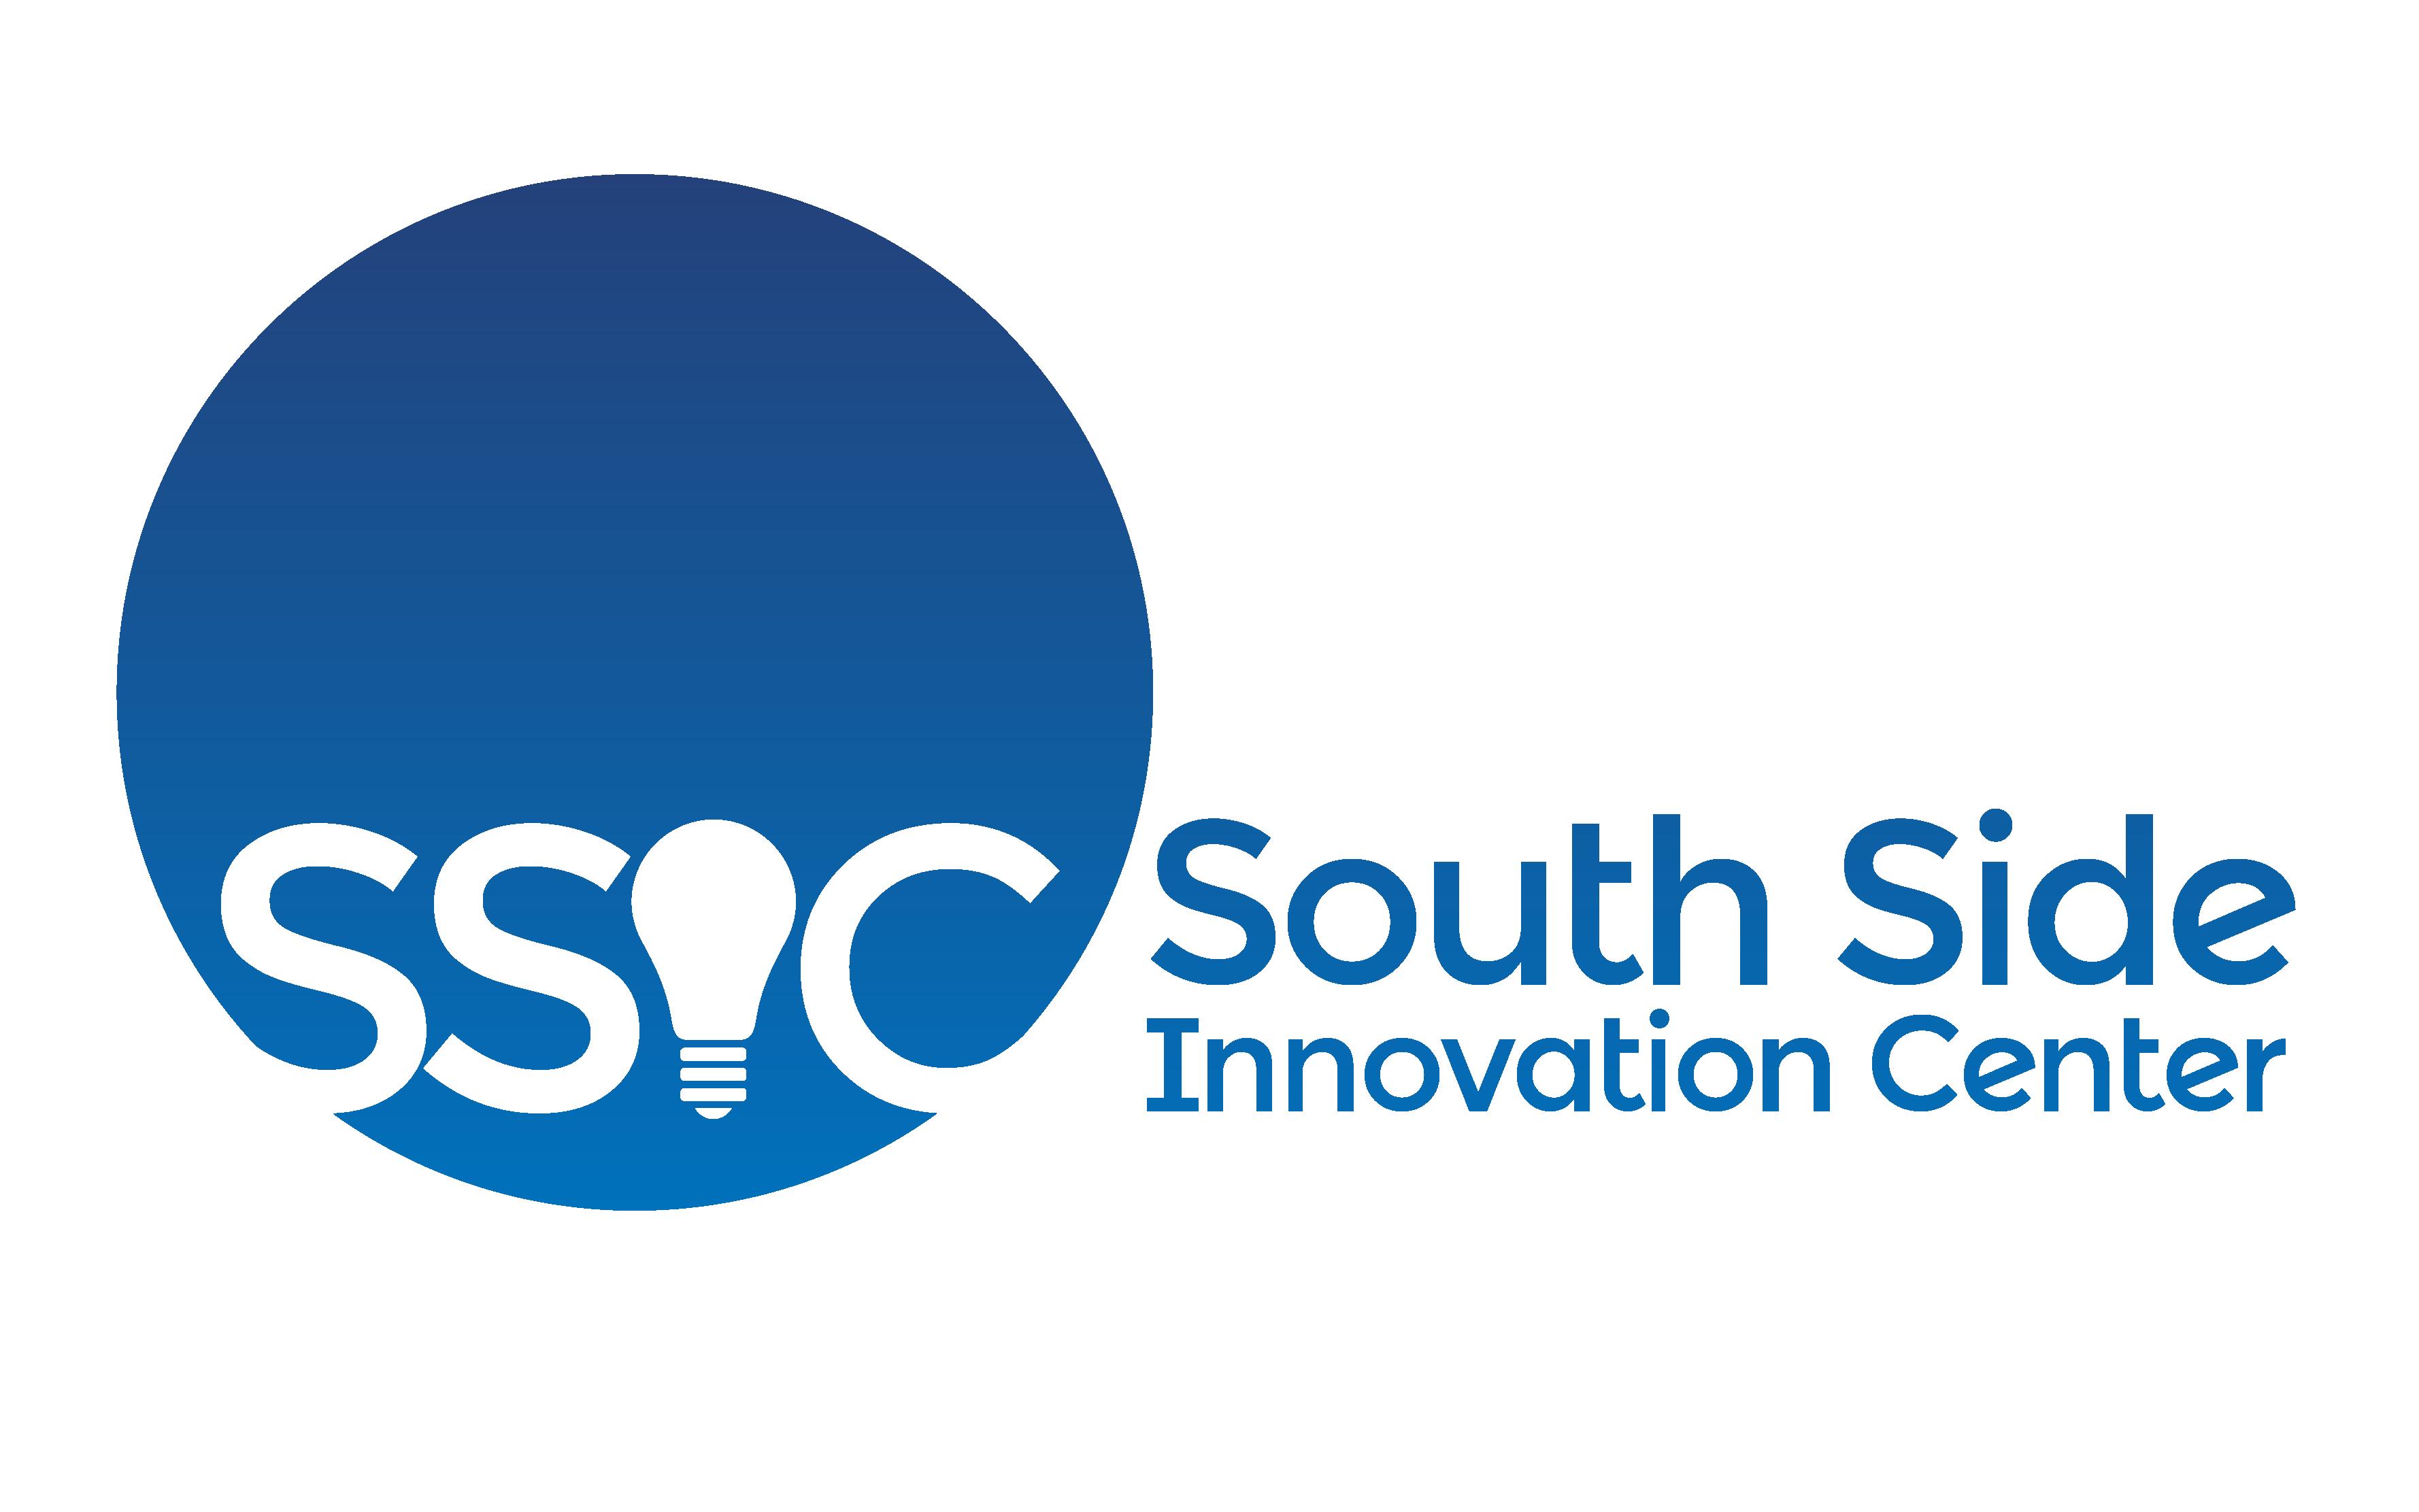 South Side Innovation Center